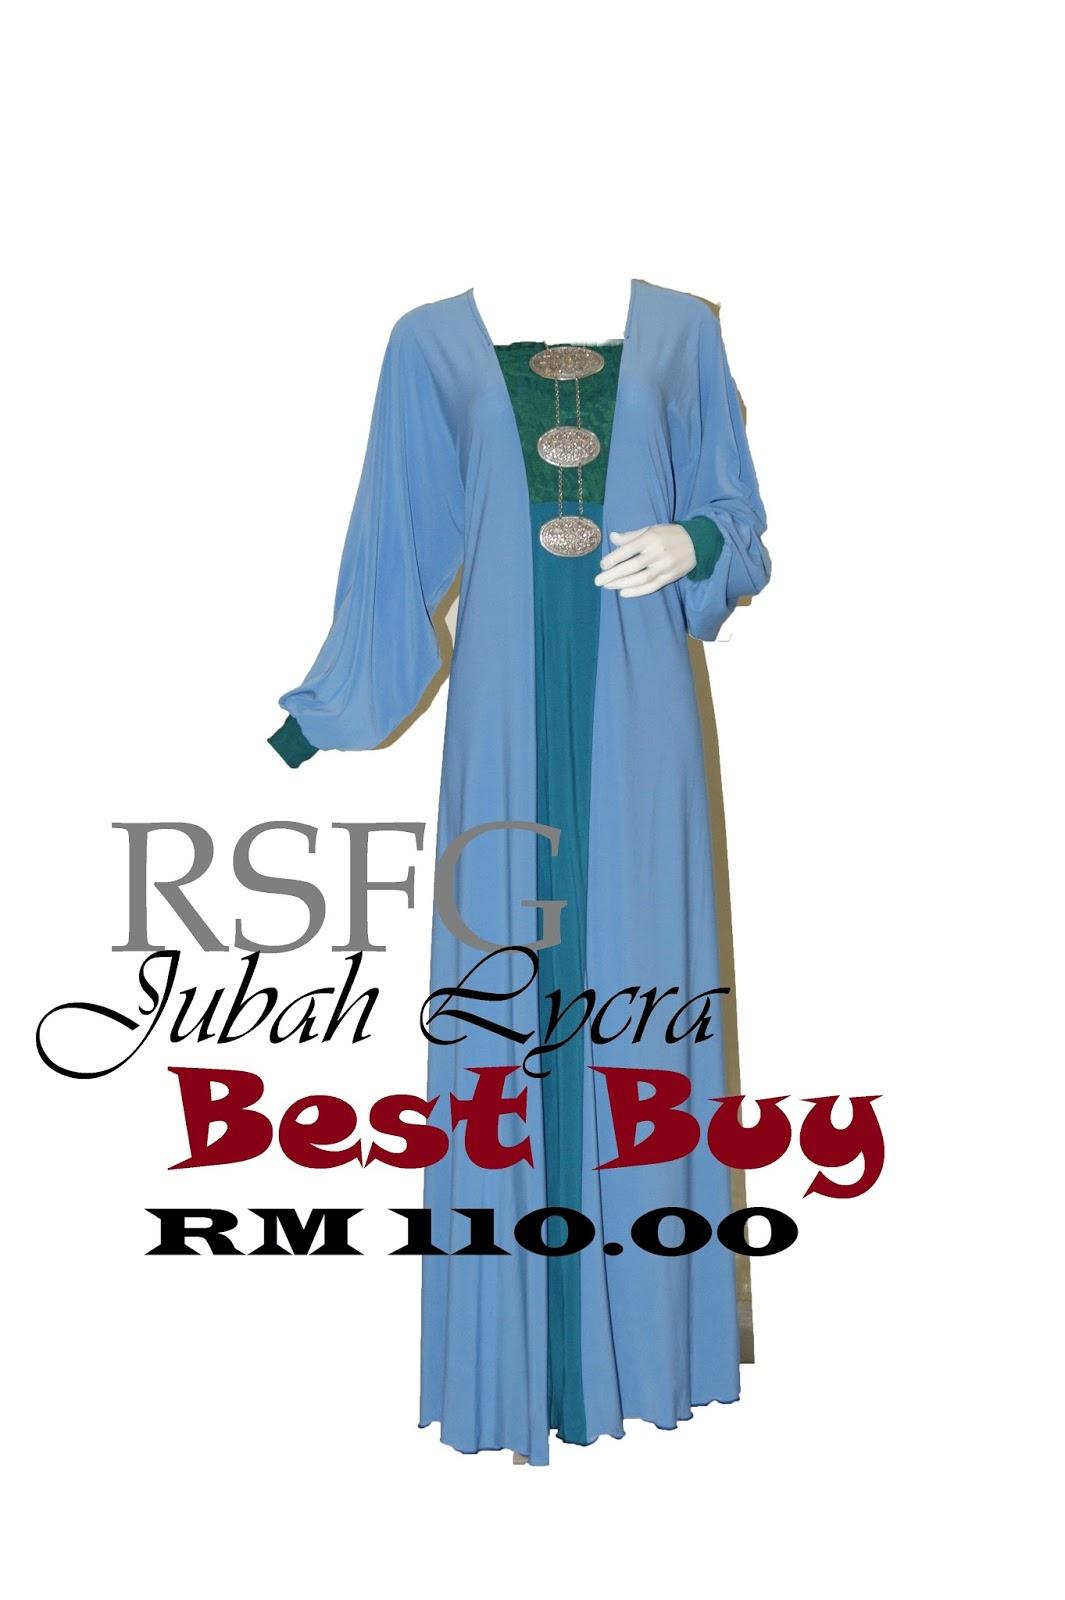 R S F G Rahim Simon Fashion Gallery Pemborong Pakaian Muslimah Dan Jahit Pukal Di Johor Bahru